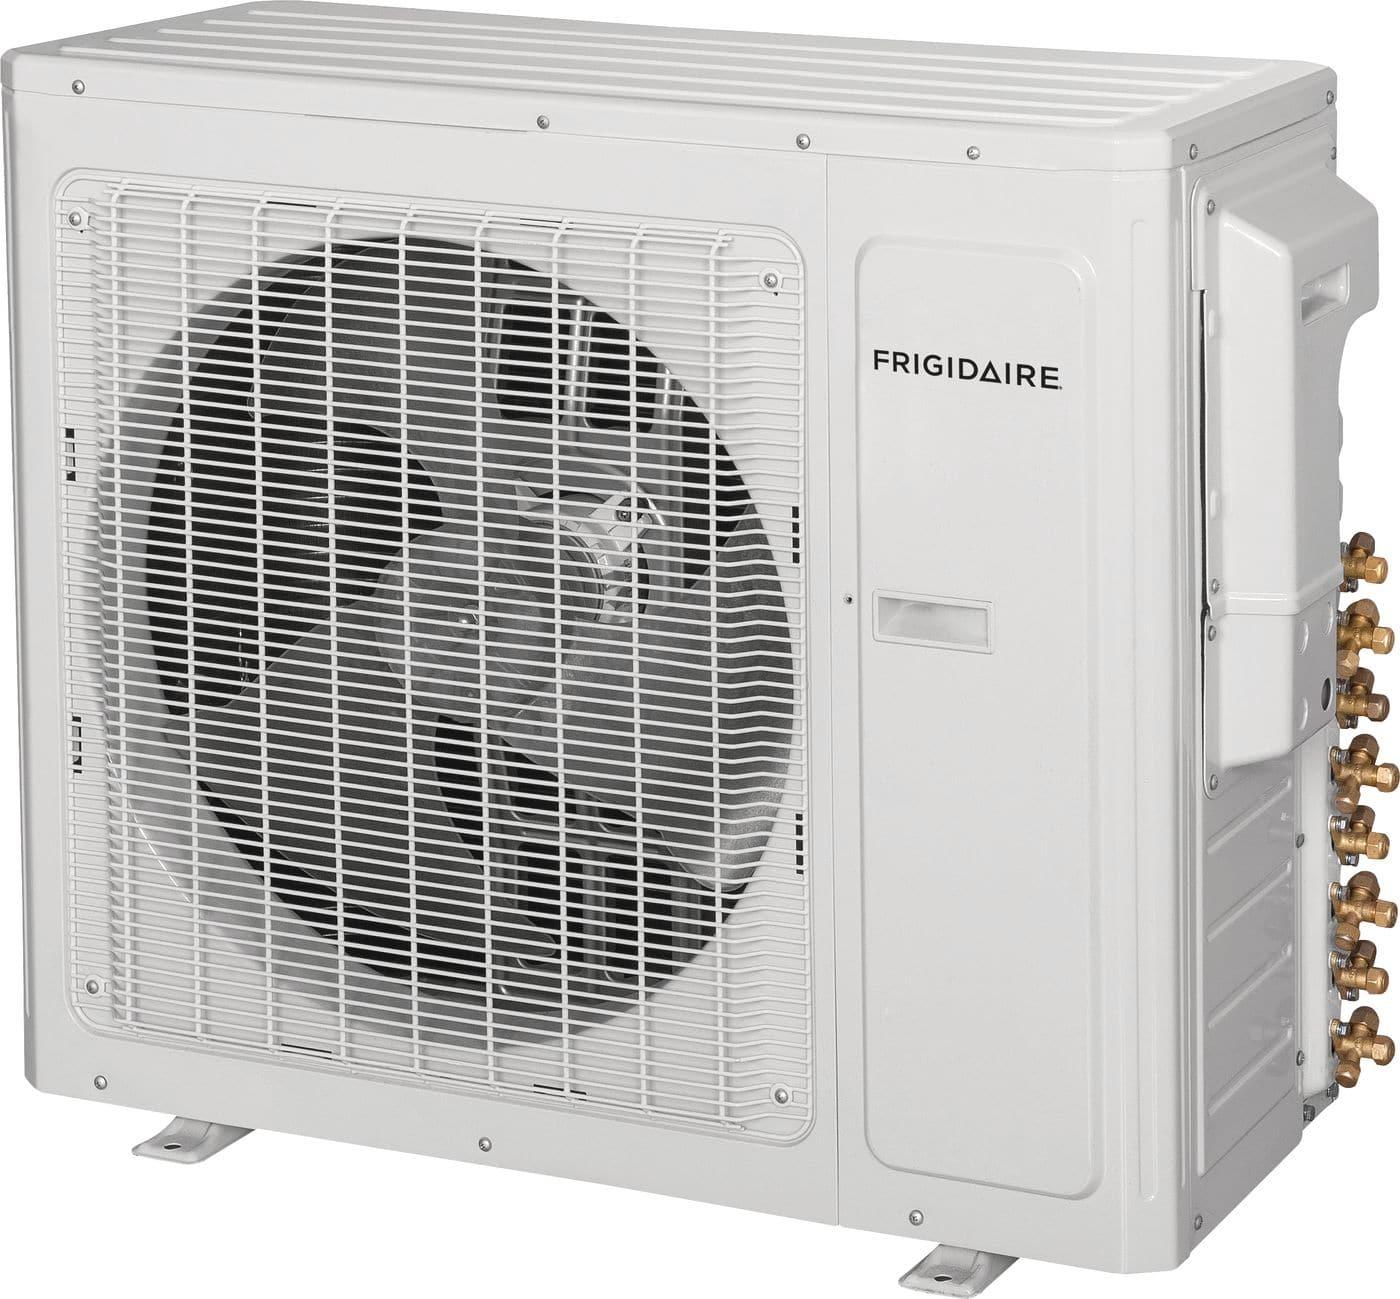 Model: FFHP242ZQ2 | Frigidaire Ductless Split Air Conditioner with Heat Pump, 26,000btu 208/230volt